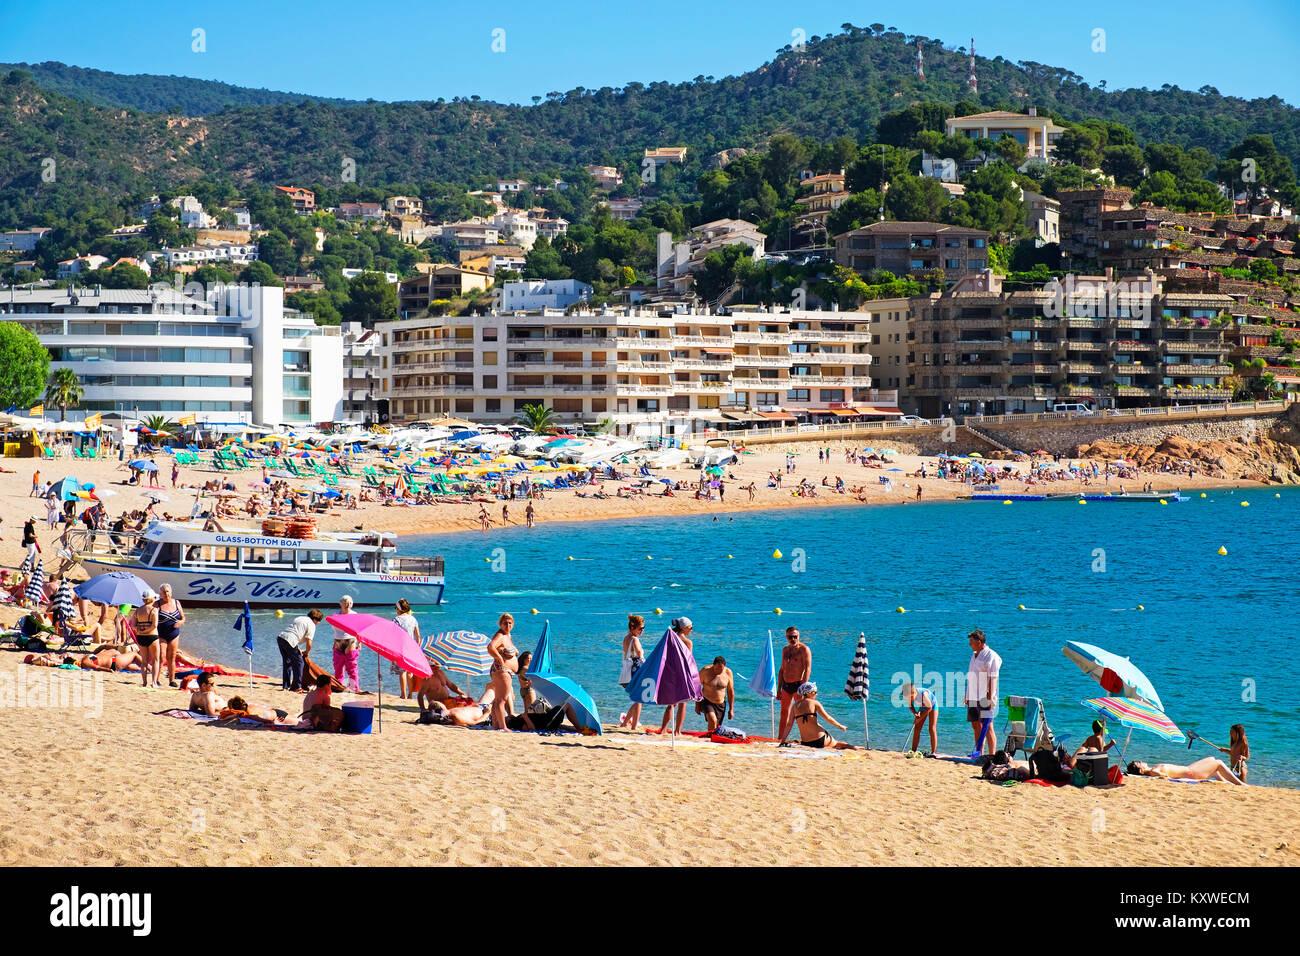 Sommer an der Costa Brava, Tossa de Mar, Katalonien, Espana, Spanien, Stockbild